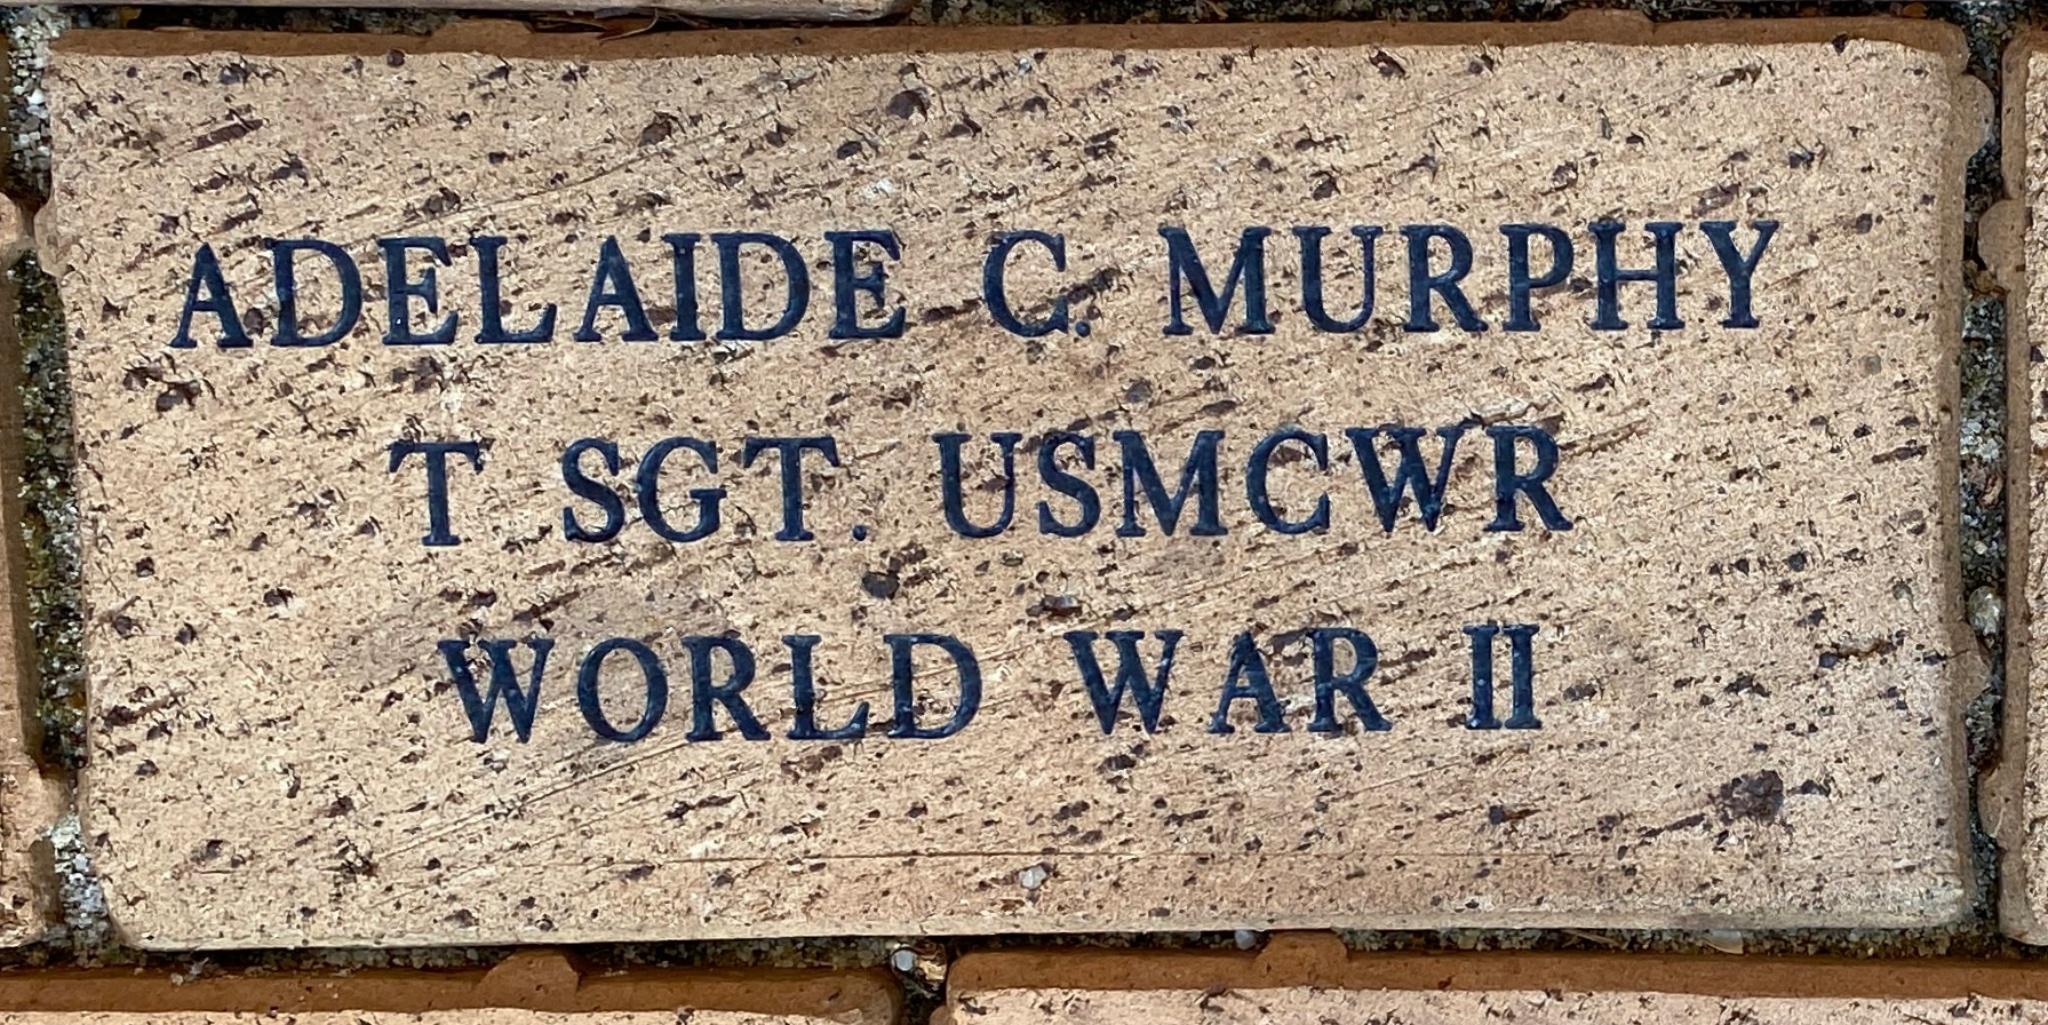 ADELAIDE C MURPHY T SGT. USMCWR WORLD WAR II